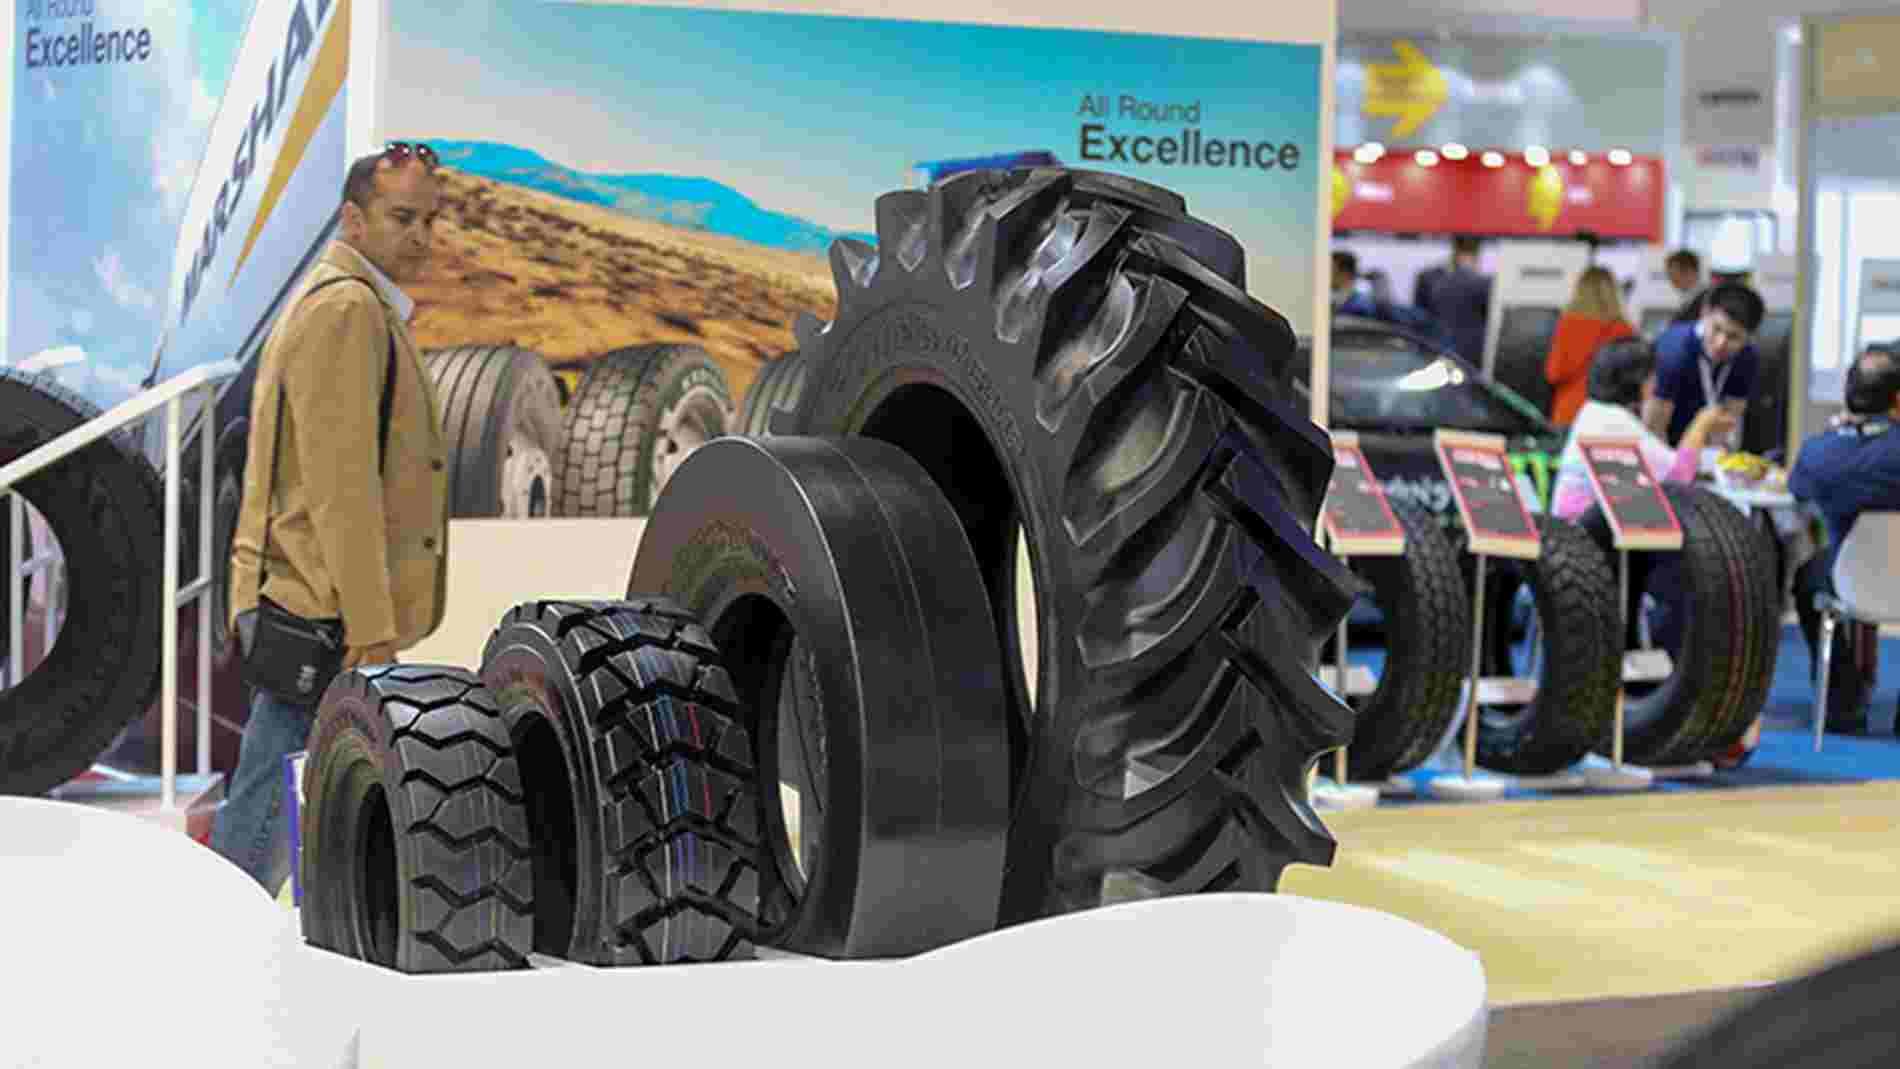 Automechanika Dubai June 10, 2019 to June 12, 2019